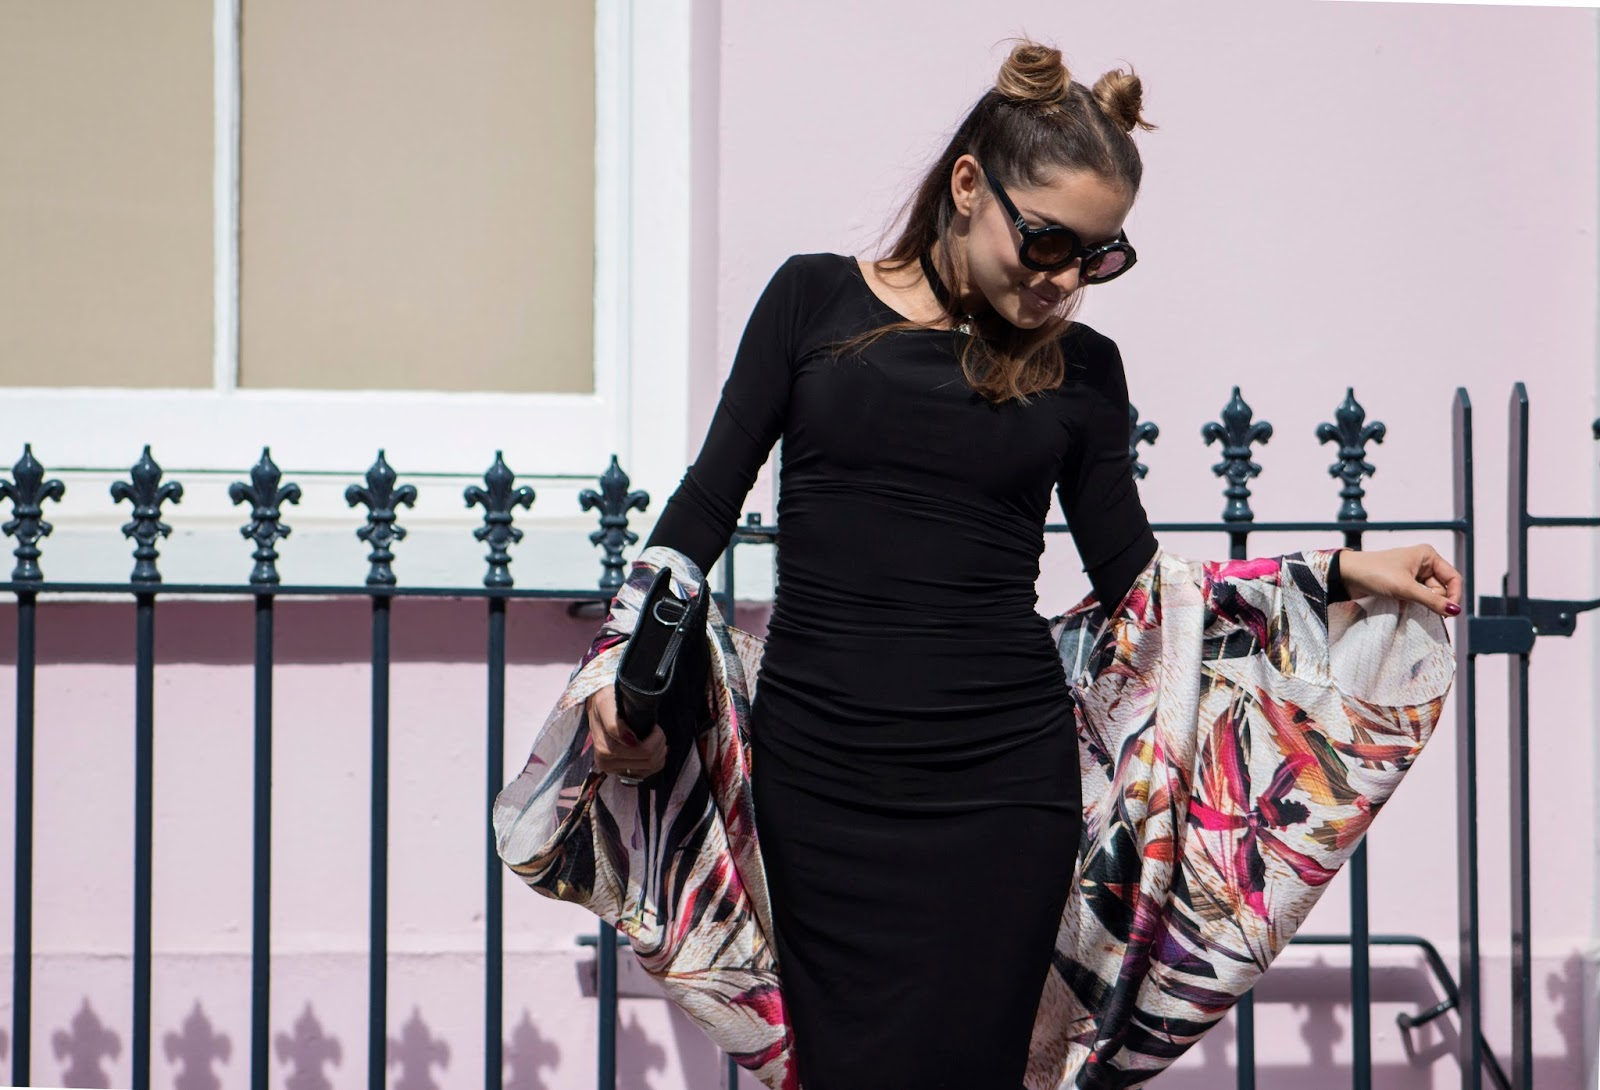 Whitney's Wonderland's Whitney Valverde UK Top Luxury Fashion Blogger wears Nooki cape exclusive to The Dressing Room, Kamali Kulture black dress, Rock 'n Rose choker, Wildfox twiggy sunglasses and Sam Edelman black pointy heels